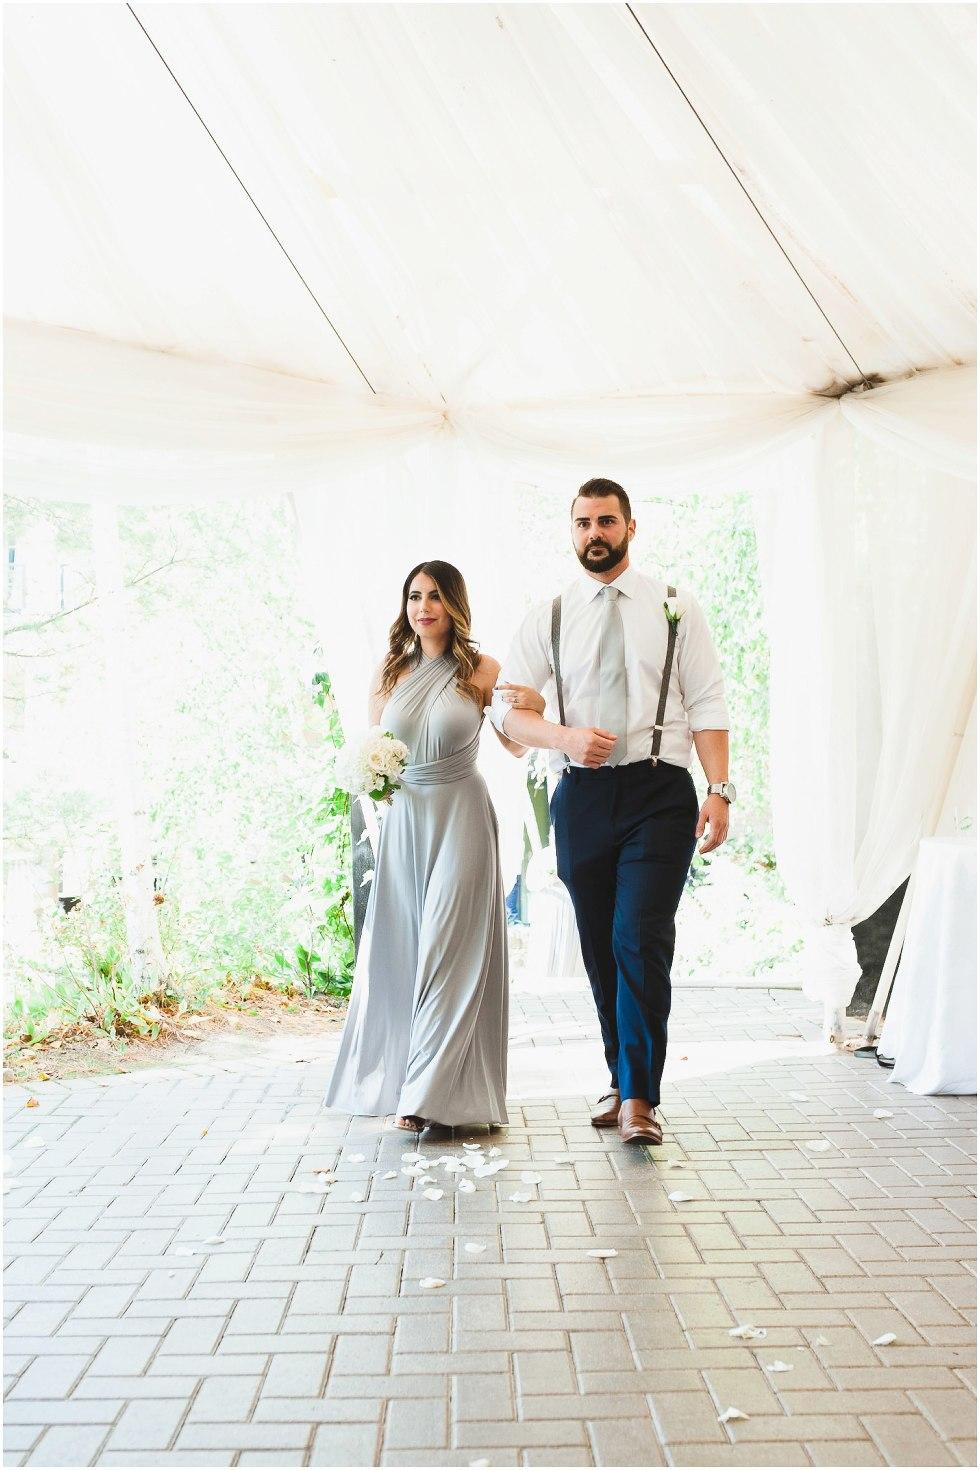 same sex wedding photography Hockley Valley Resort Gillian Foster